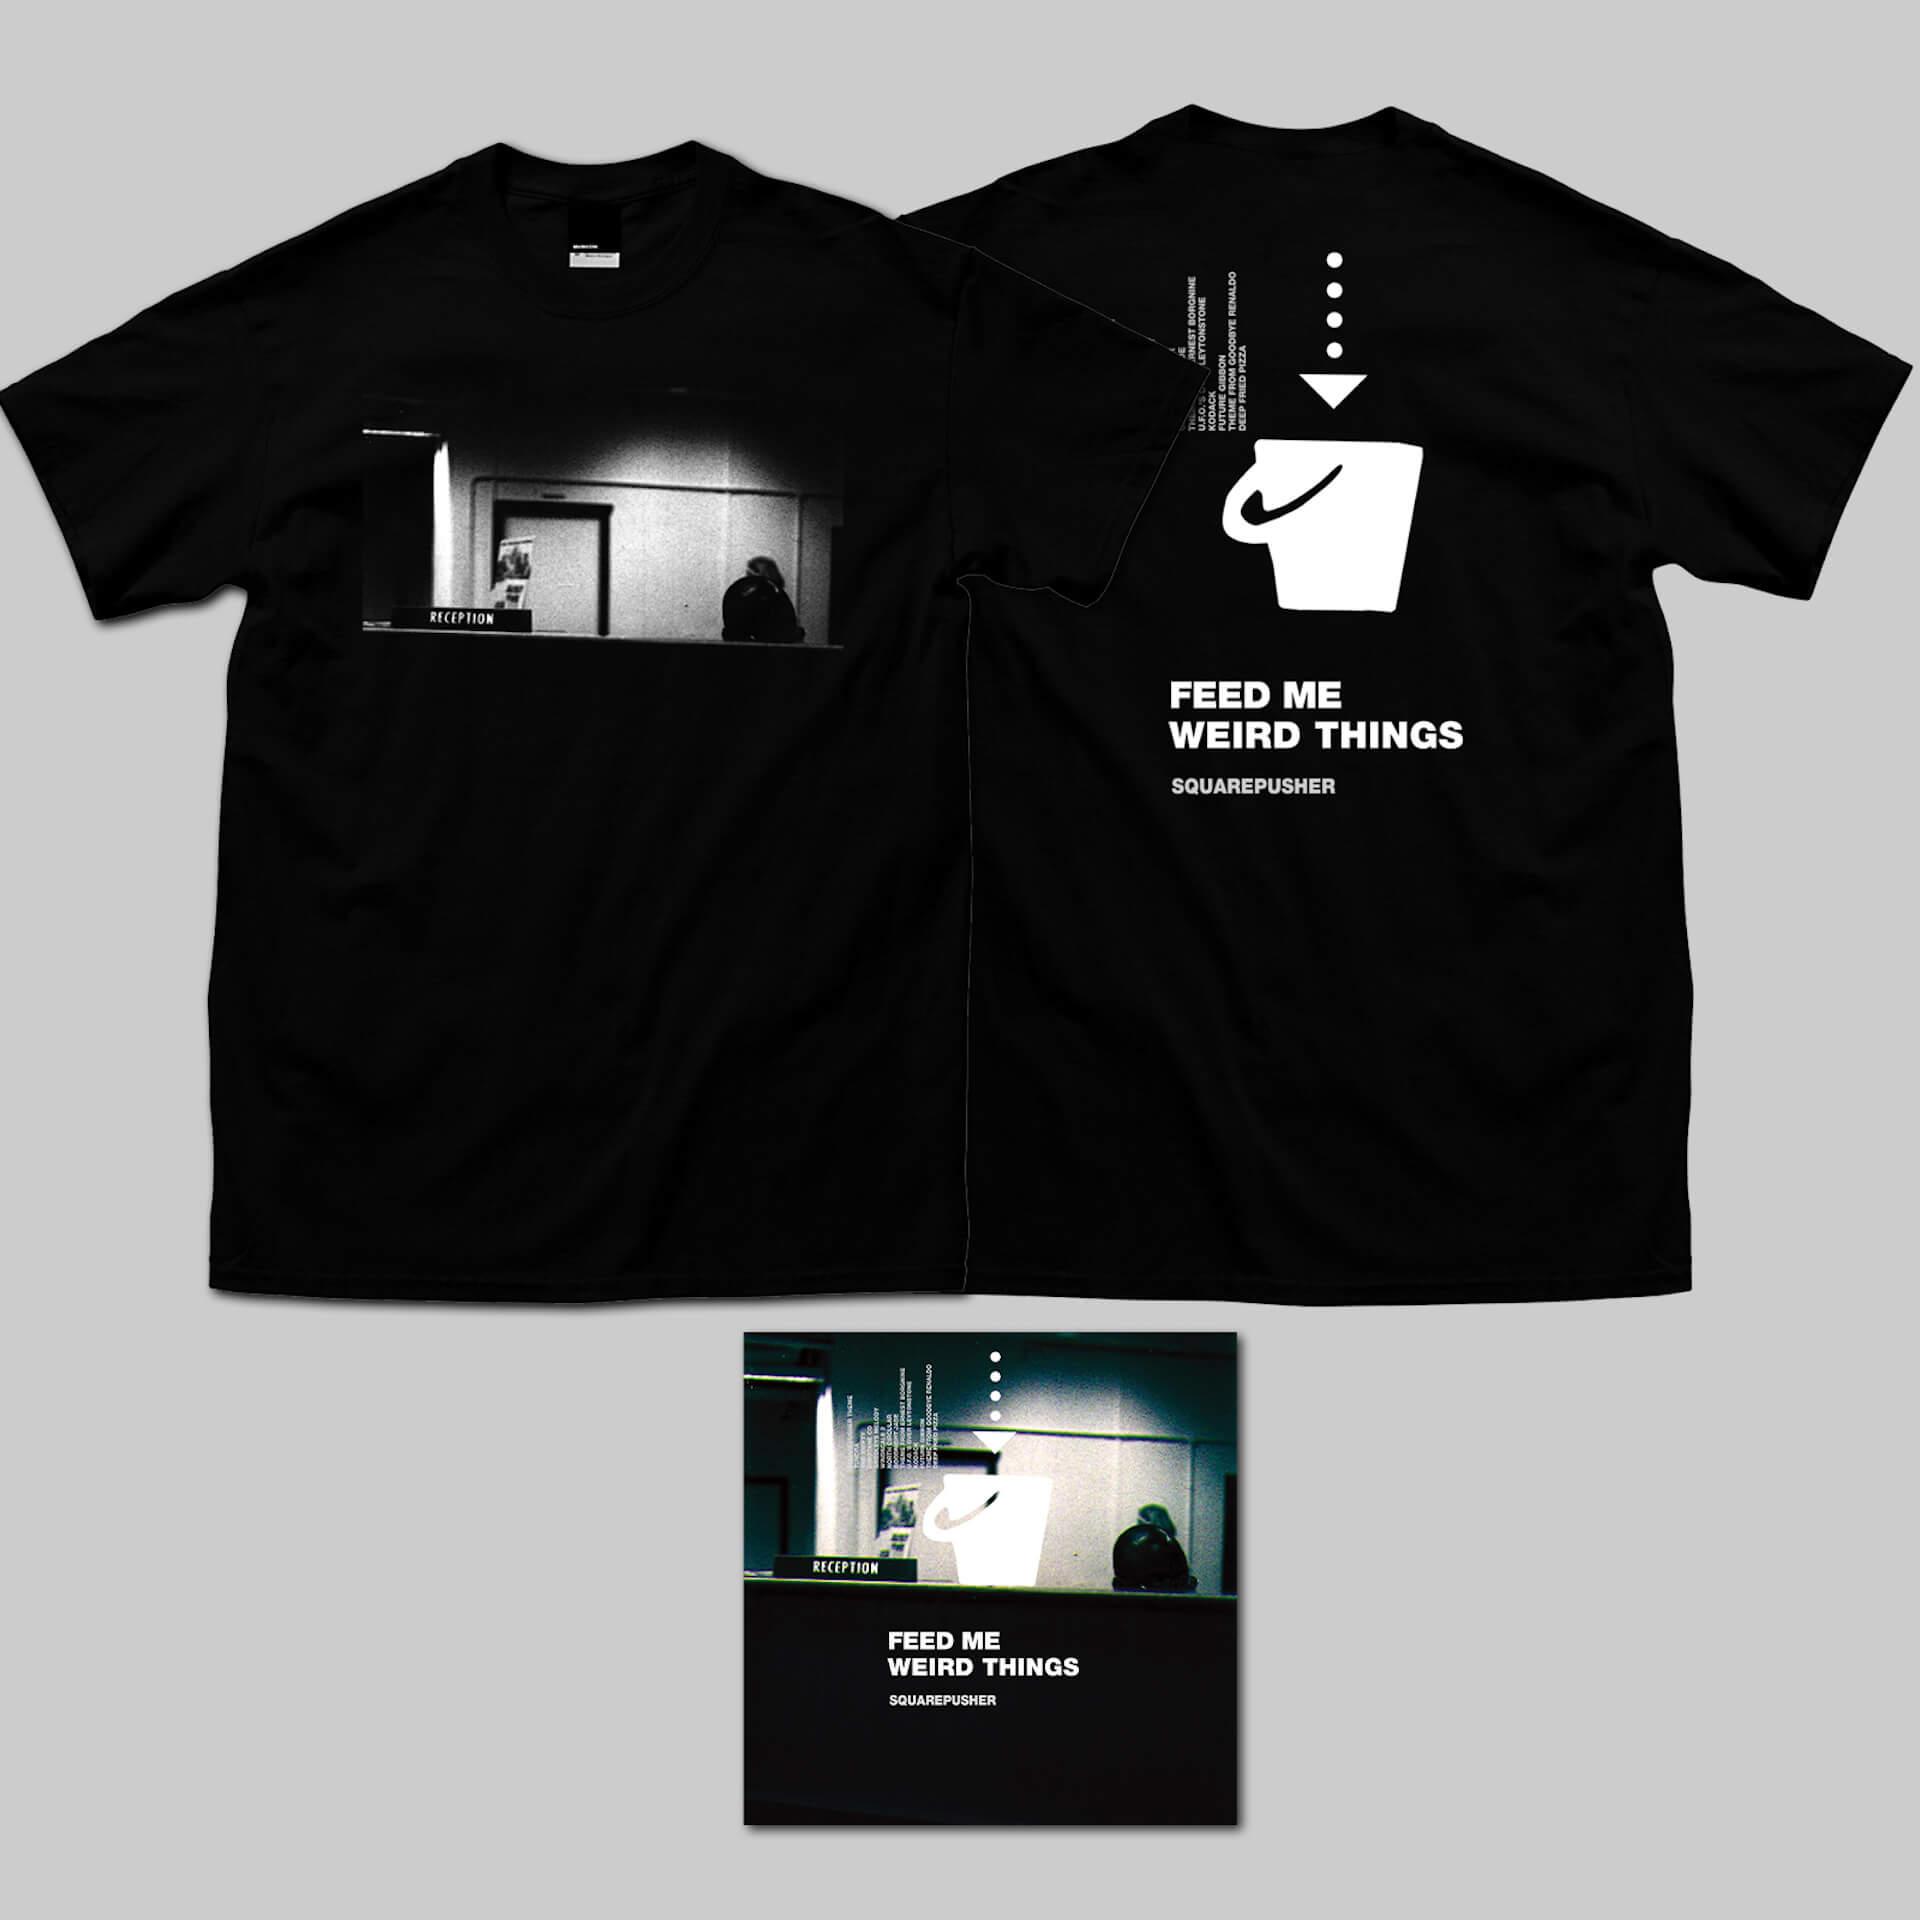 Squarepusherデビューアルバム『Feed Me Weird Things』再発盤が本日ついに発売!待望のサブスクも解禁 music210604_squarepusher_9